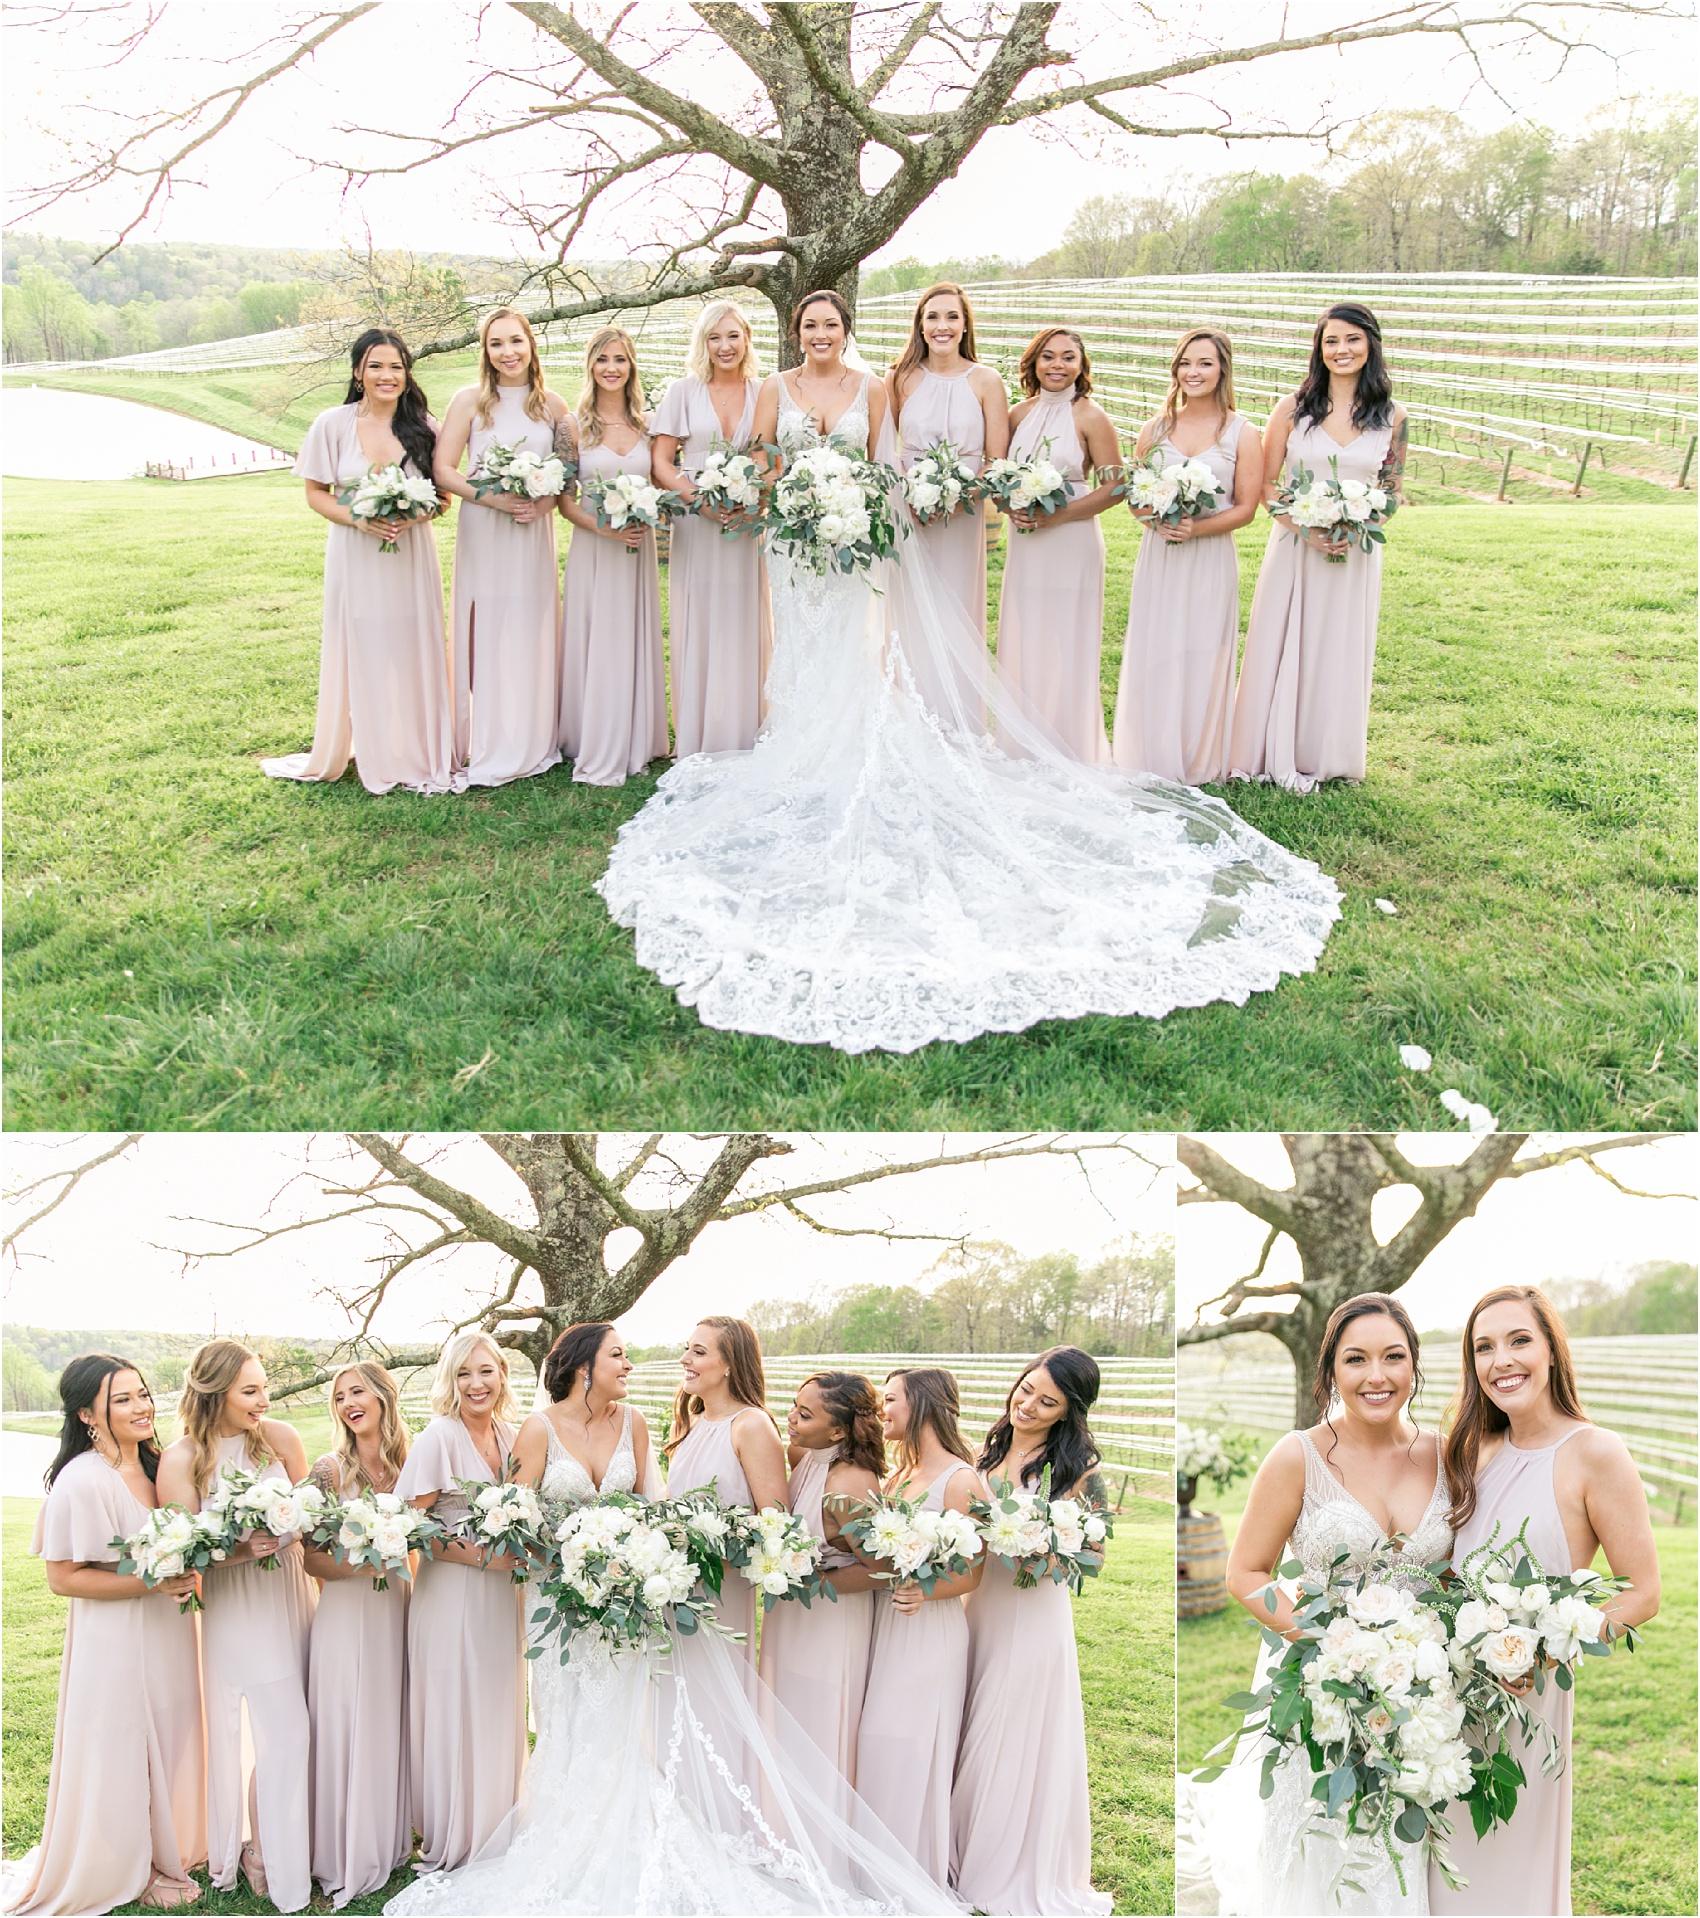 Savannah Eve Photography- Turnbill-Gilgan Wedding- Blog-59.jpg